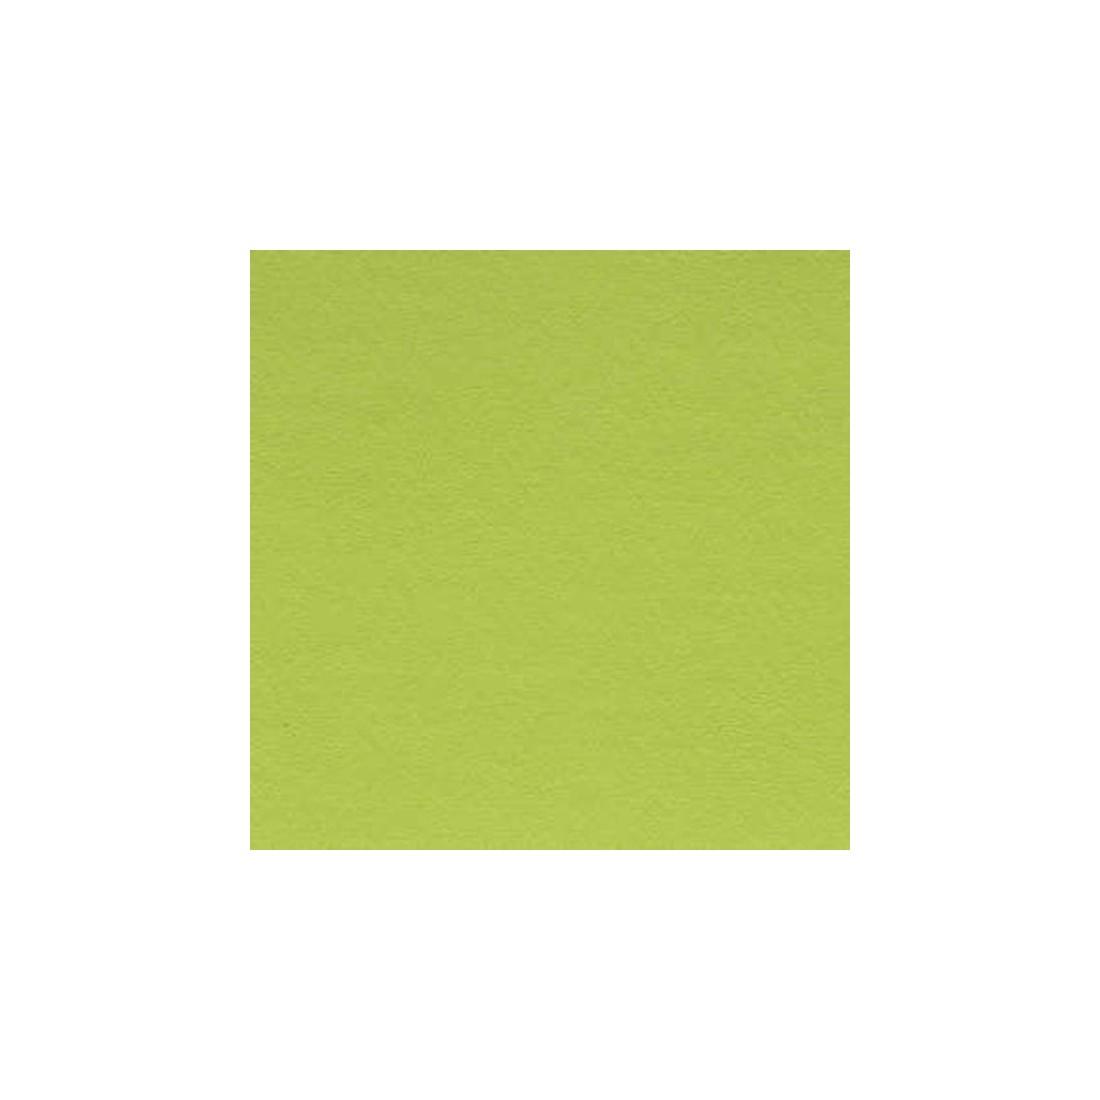 Tissu d'ameublement Joe de Boussac coloris Anis O7764015